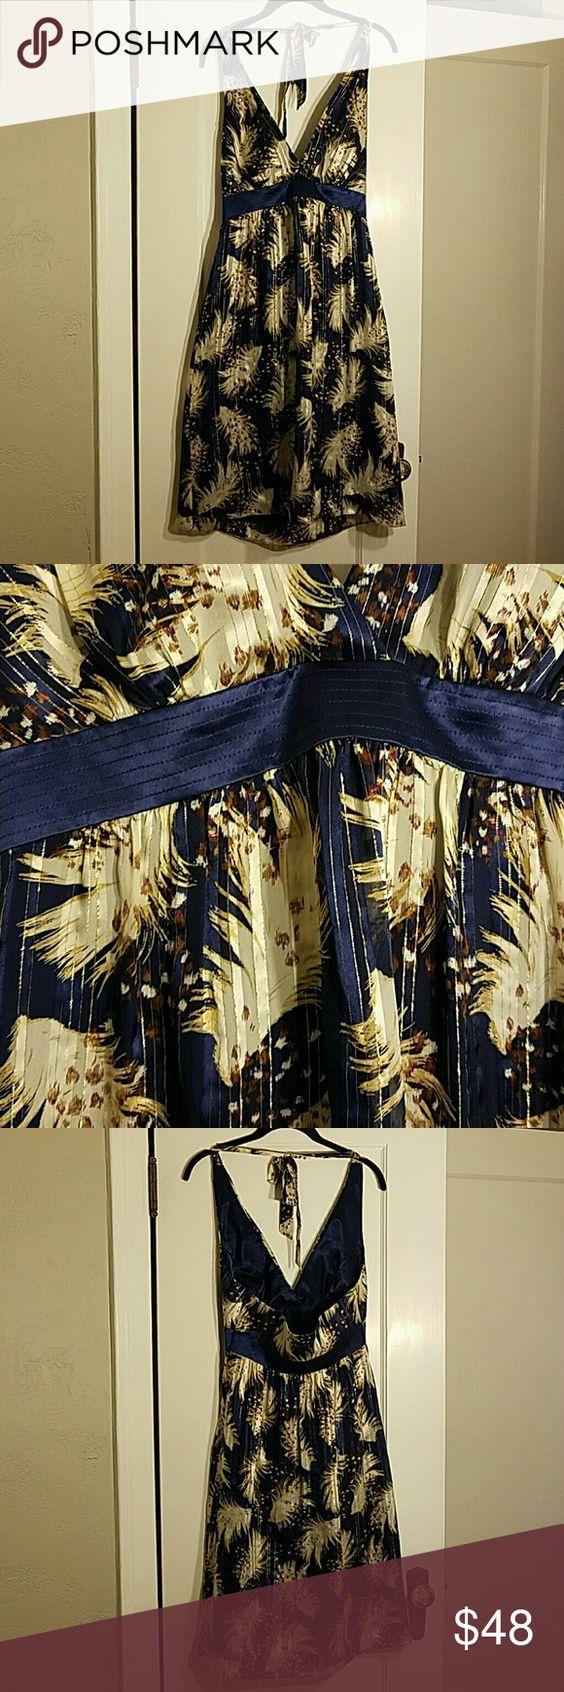 Selling this *MOVING SALE* NWT Shelli Segal Silk Halter Dress on Poshmark! My username is: katerenee18. #shopmycloset #poshmark #fashion #shopping #style #forsale #Laundry by Shelli Segal #Dresses & Skirts